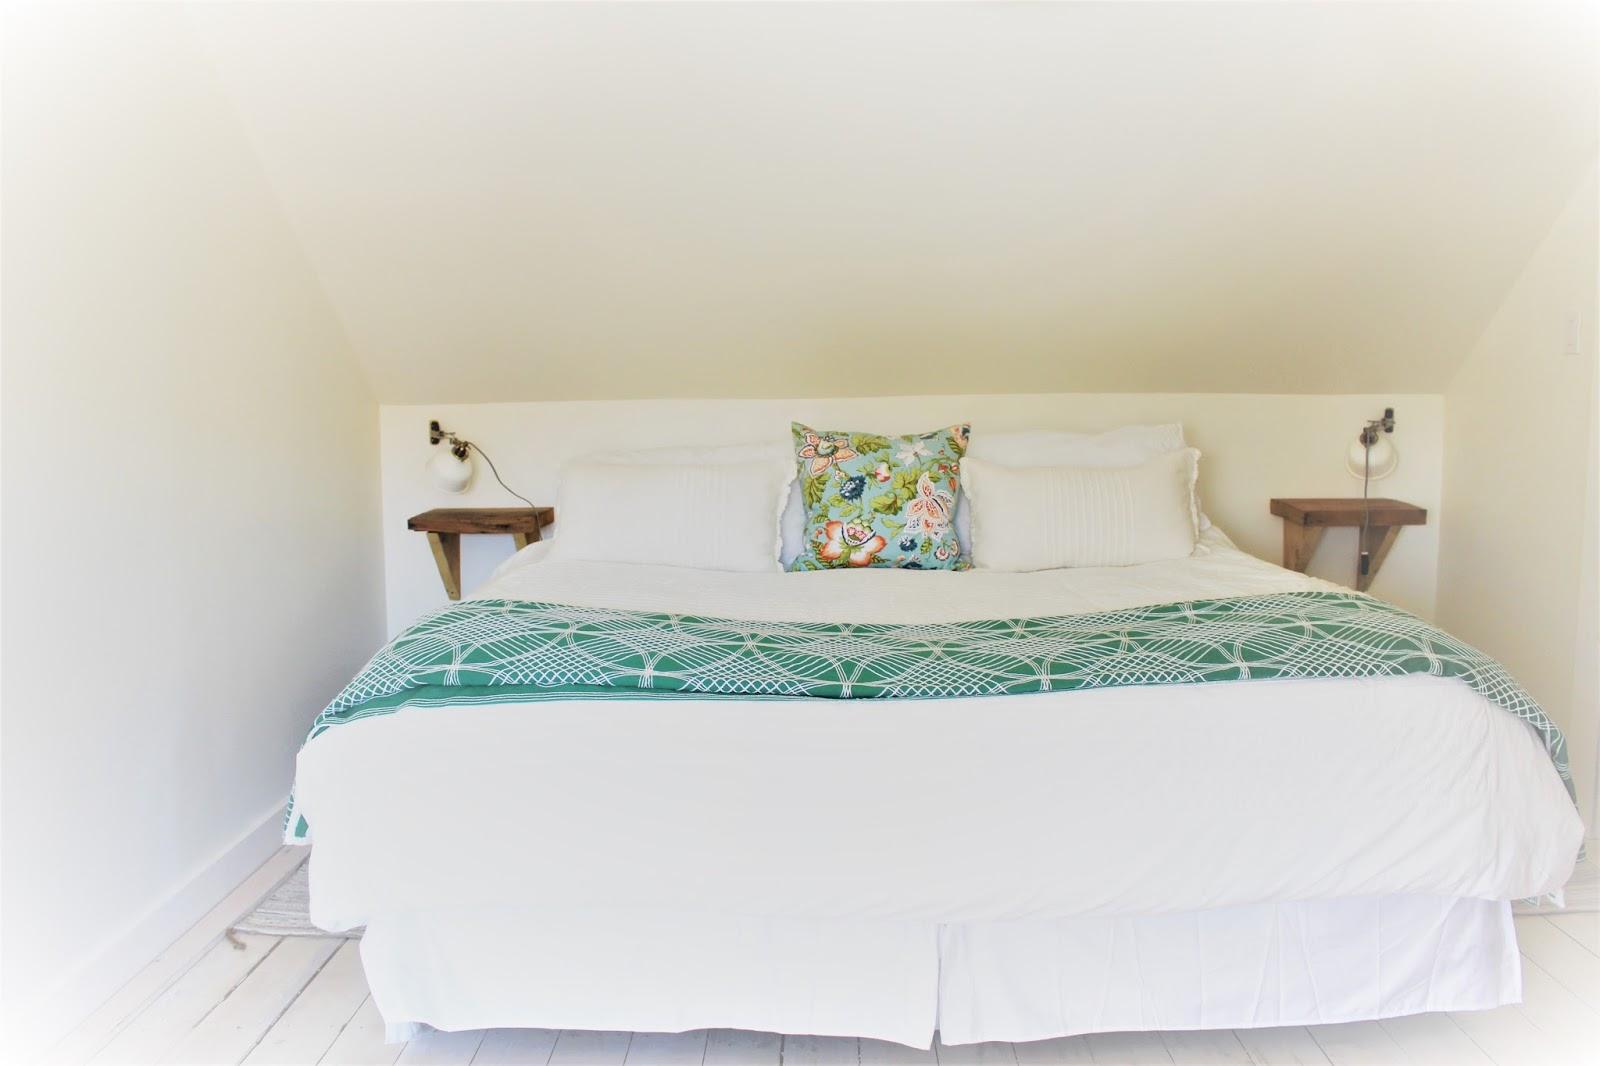 Bijuleni-The Ferg bedroom, Prince Edward County